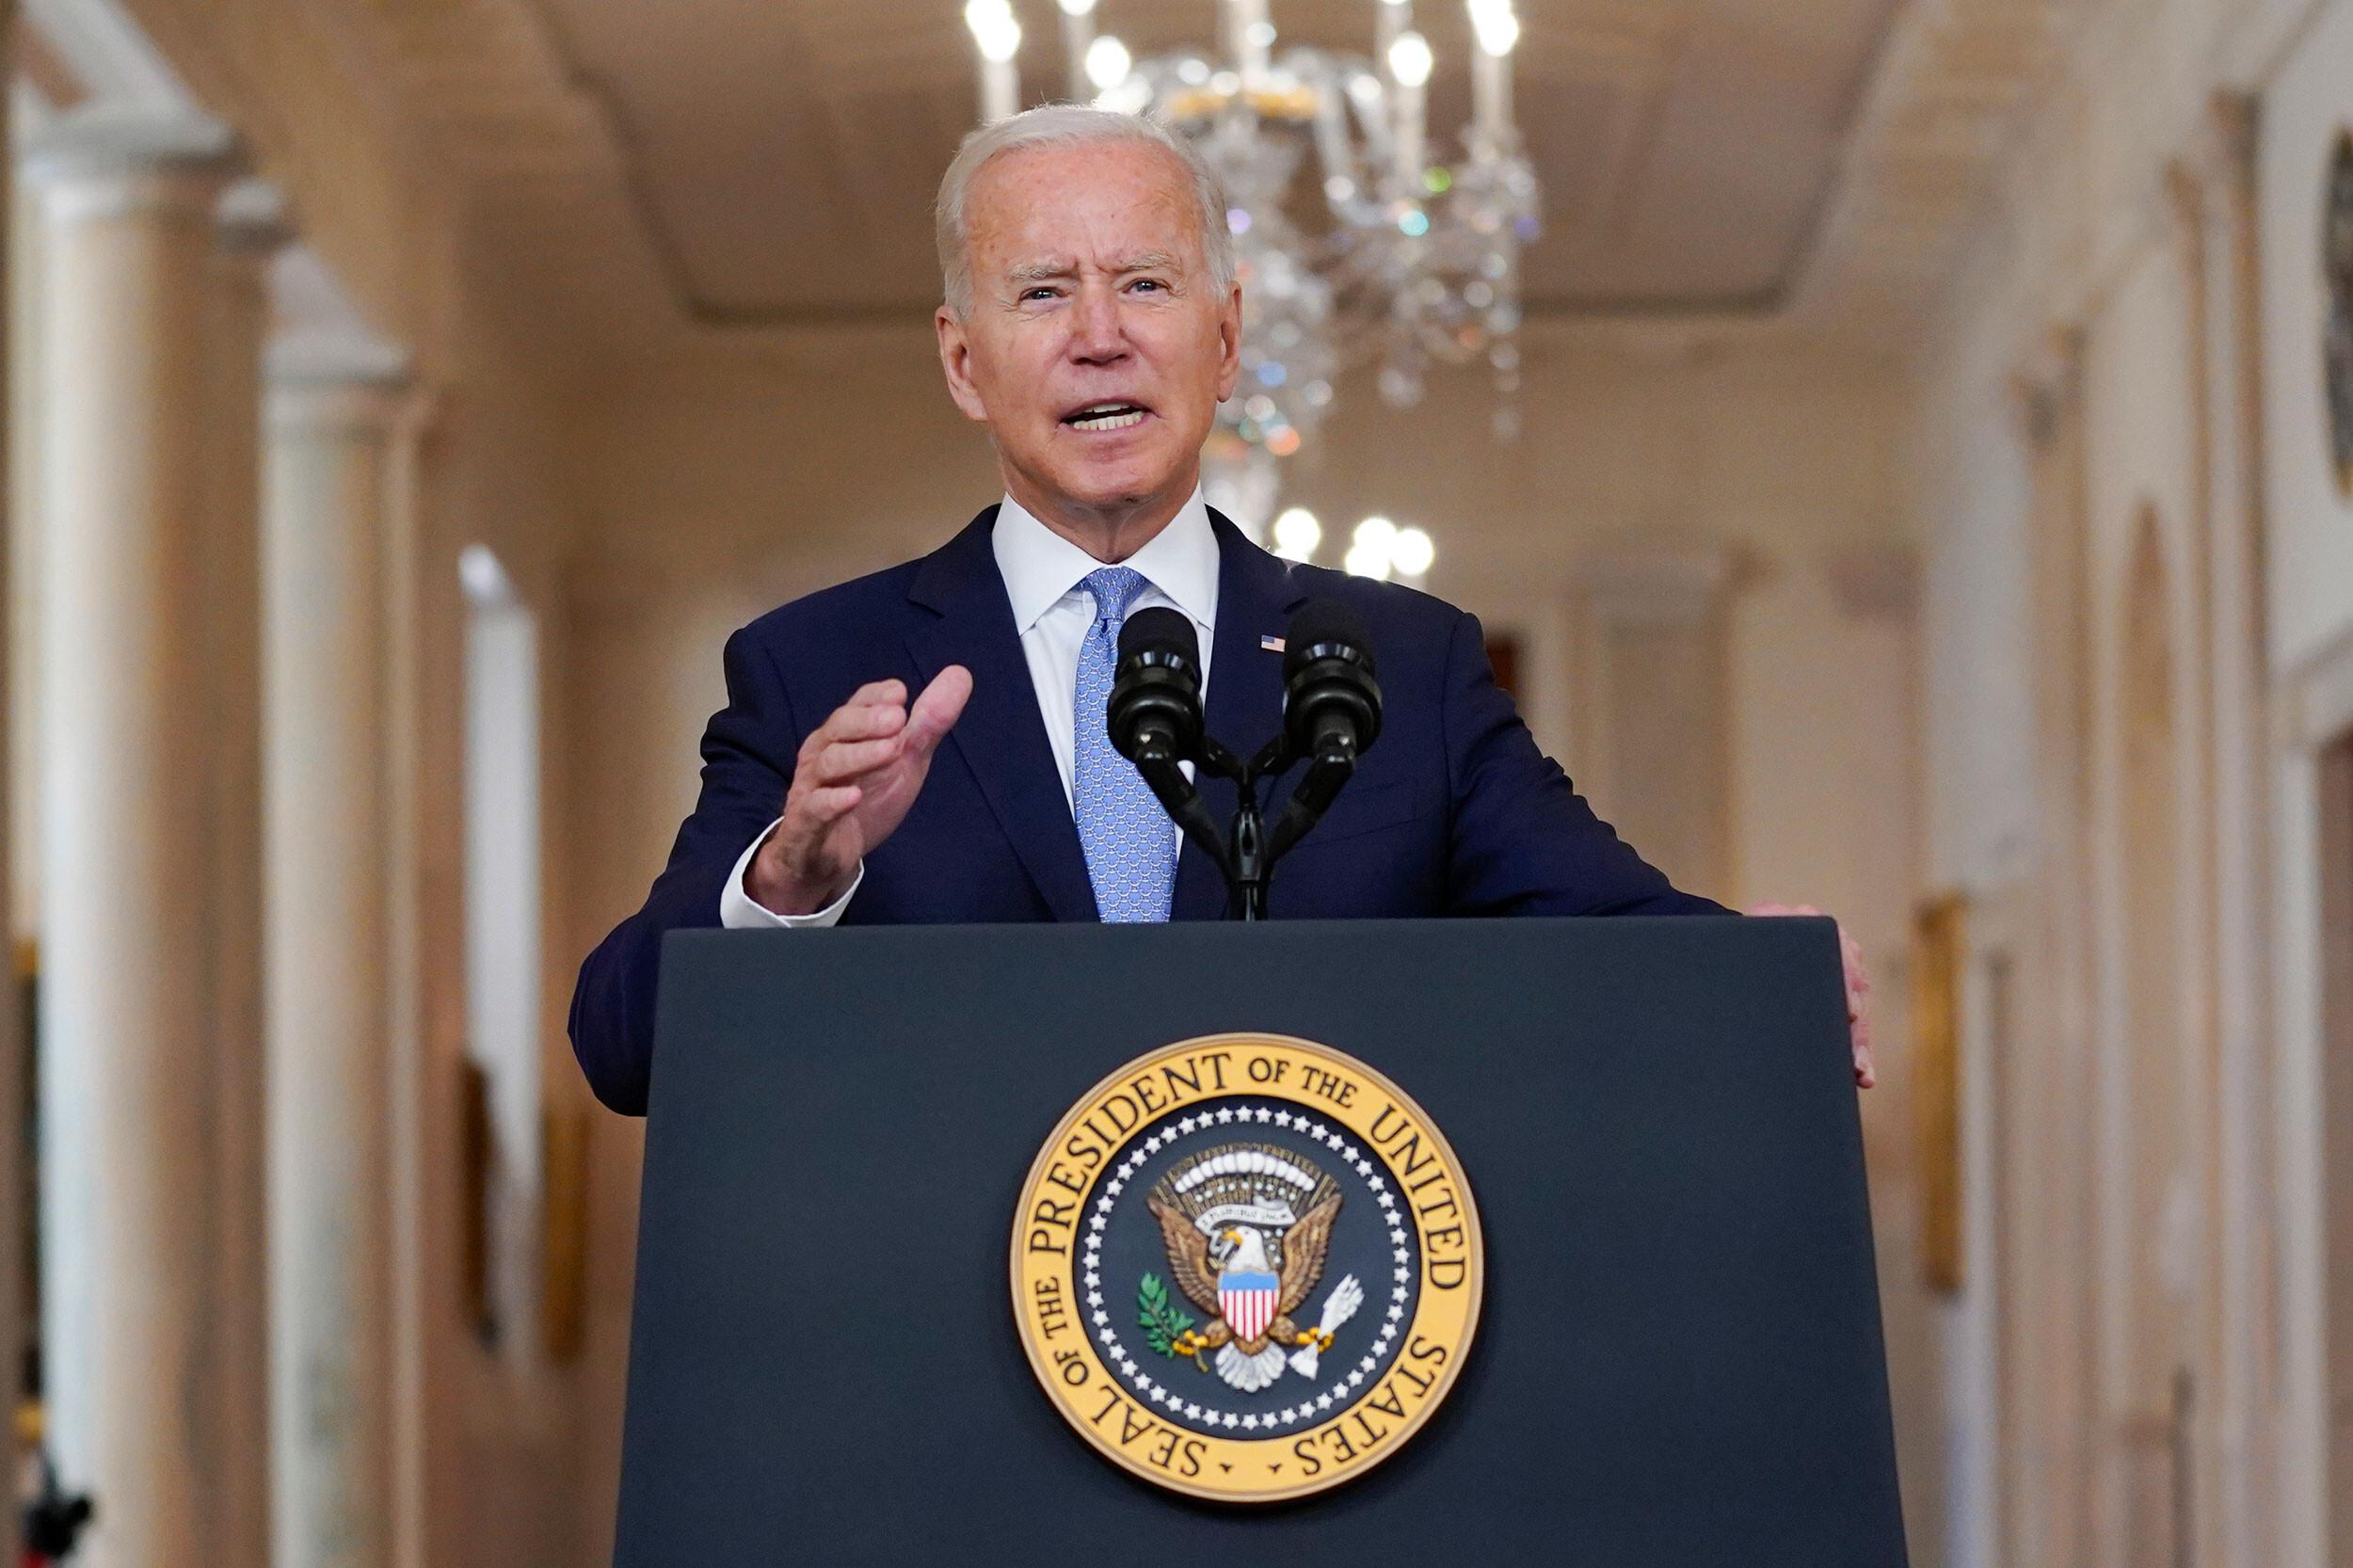 Biden says Texas' anti-abortion law is 'almost un-American' and 'sort of creates a vigilante system'